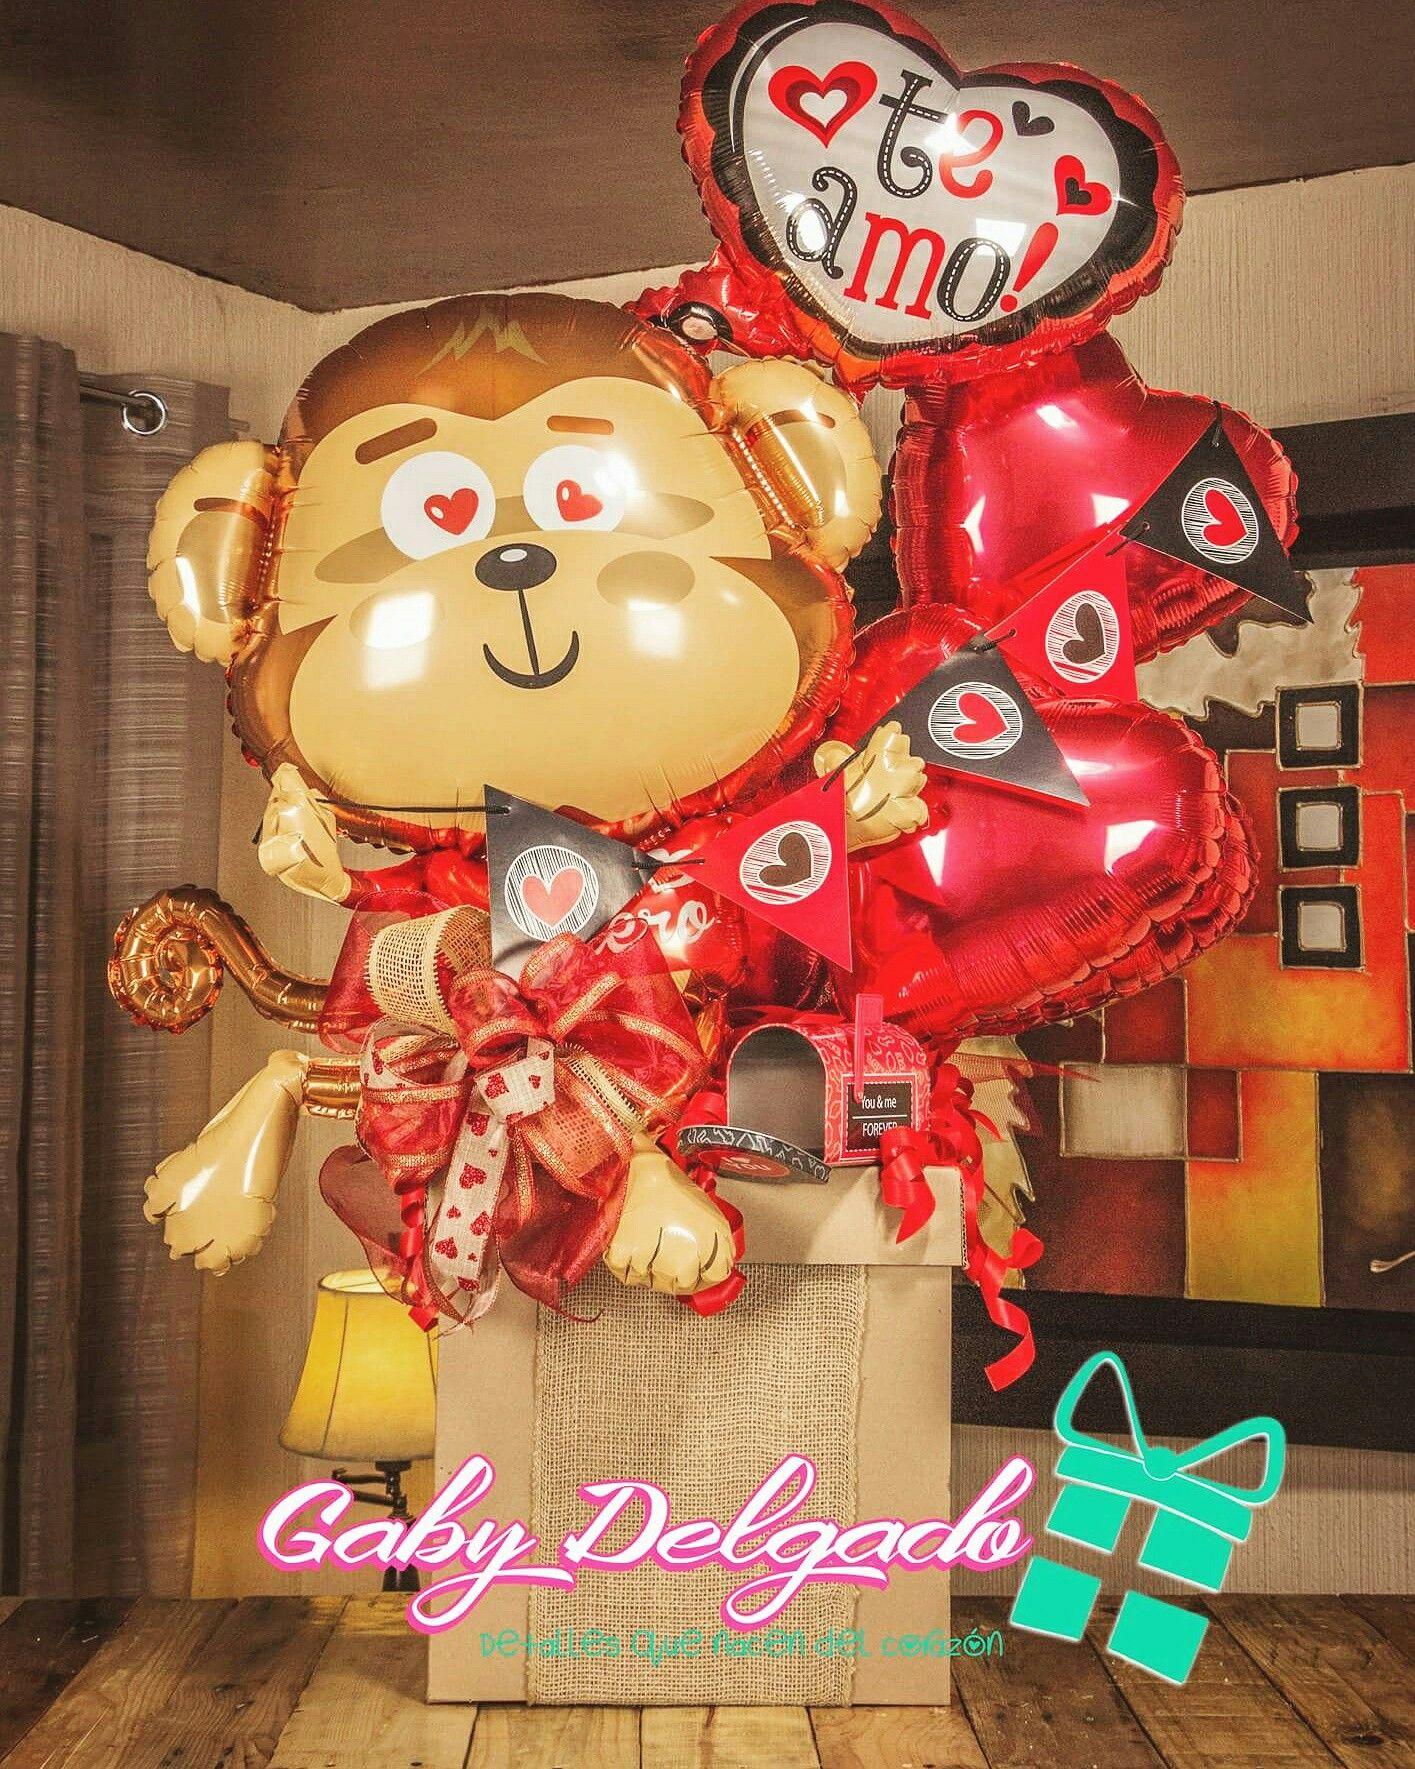 Pin by globokind on arreglos pinterest ideas san - Decoraciones para san valentin ...